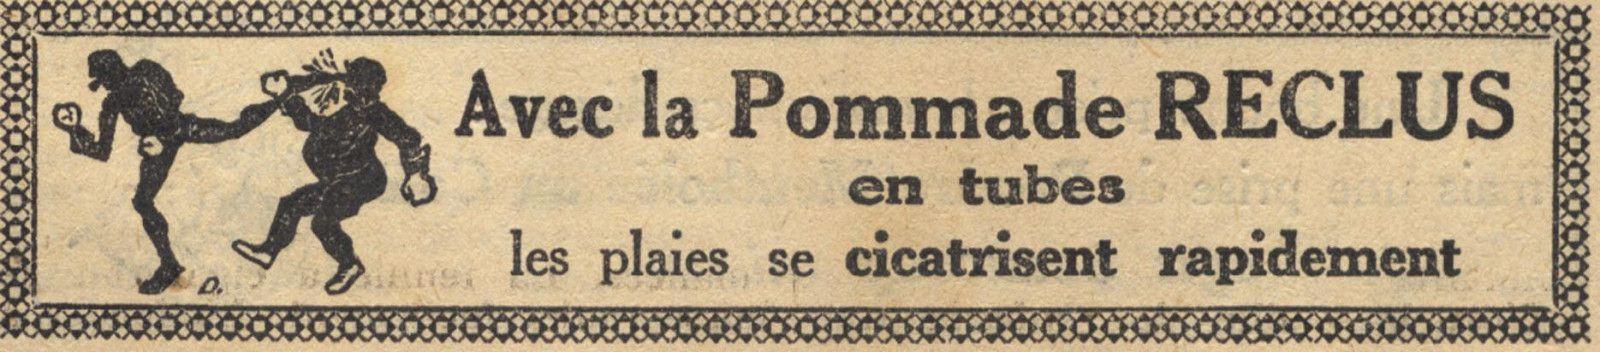 almanach françois 1929 12